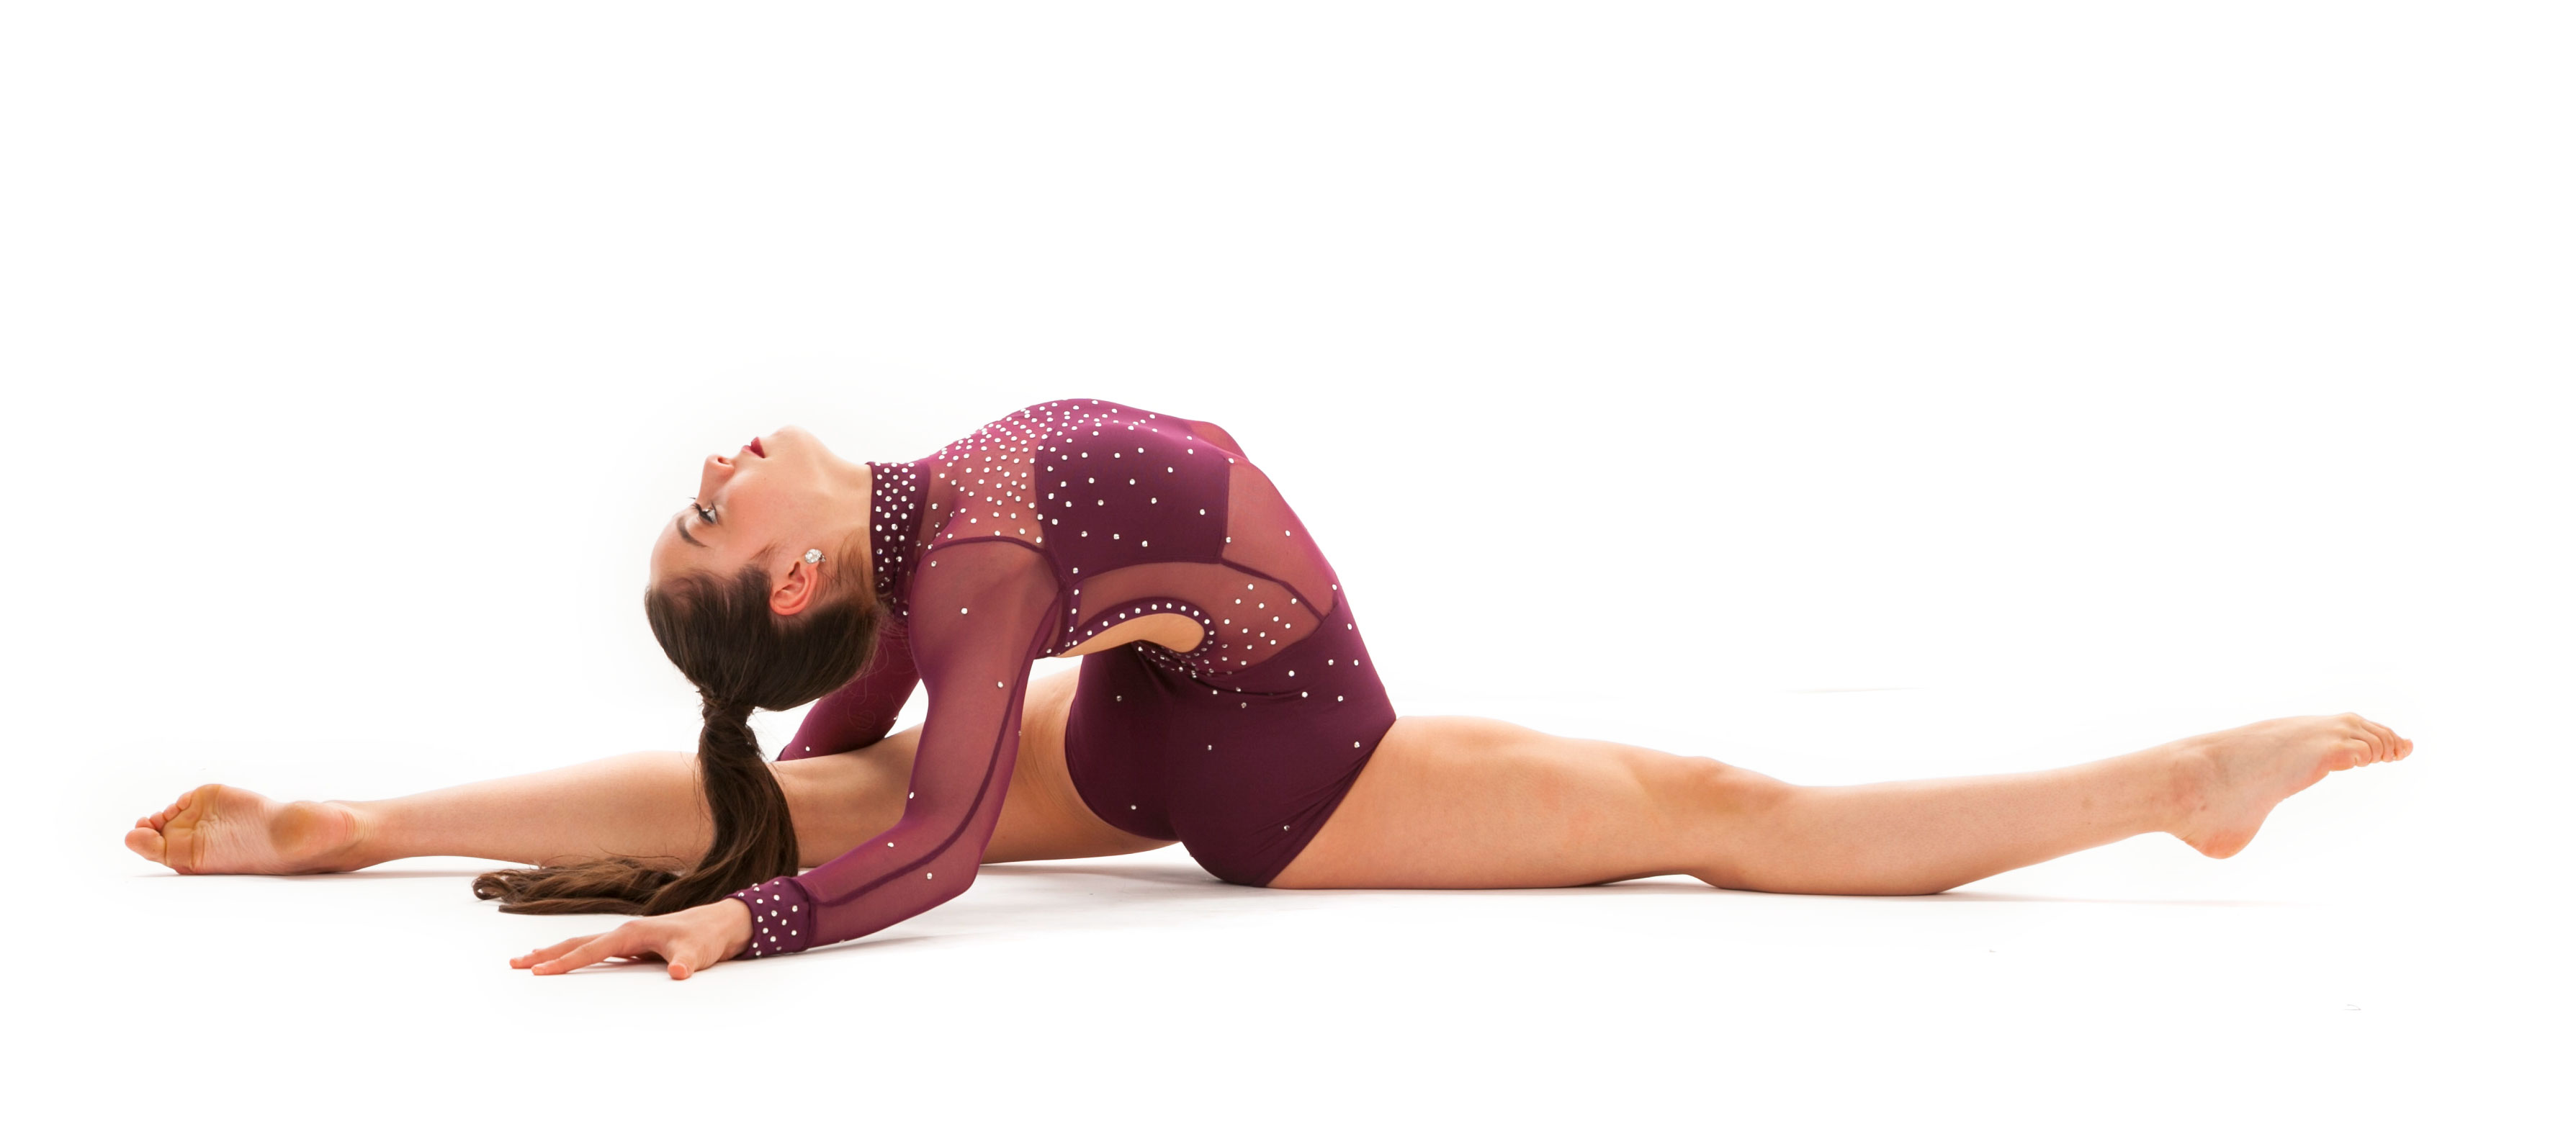 Dancer hip flexibility